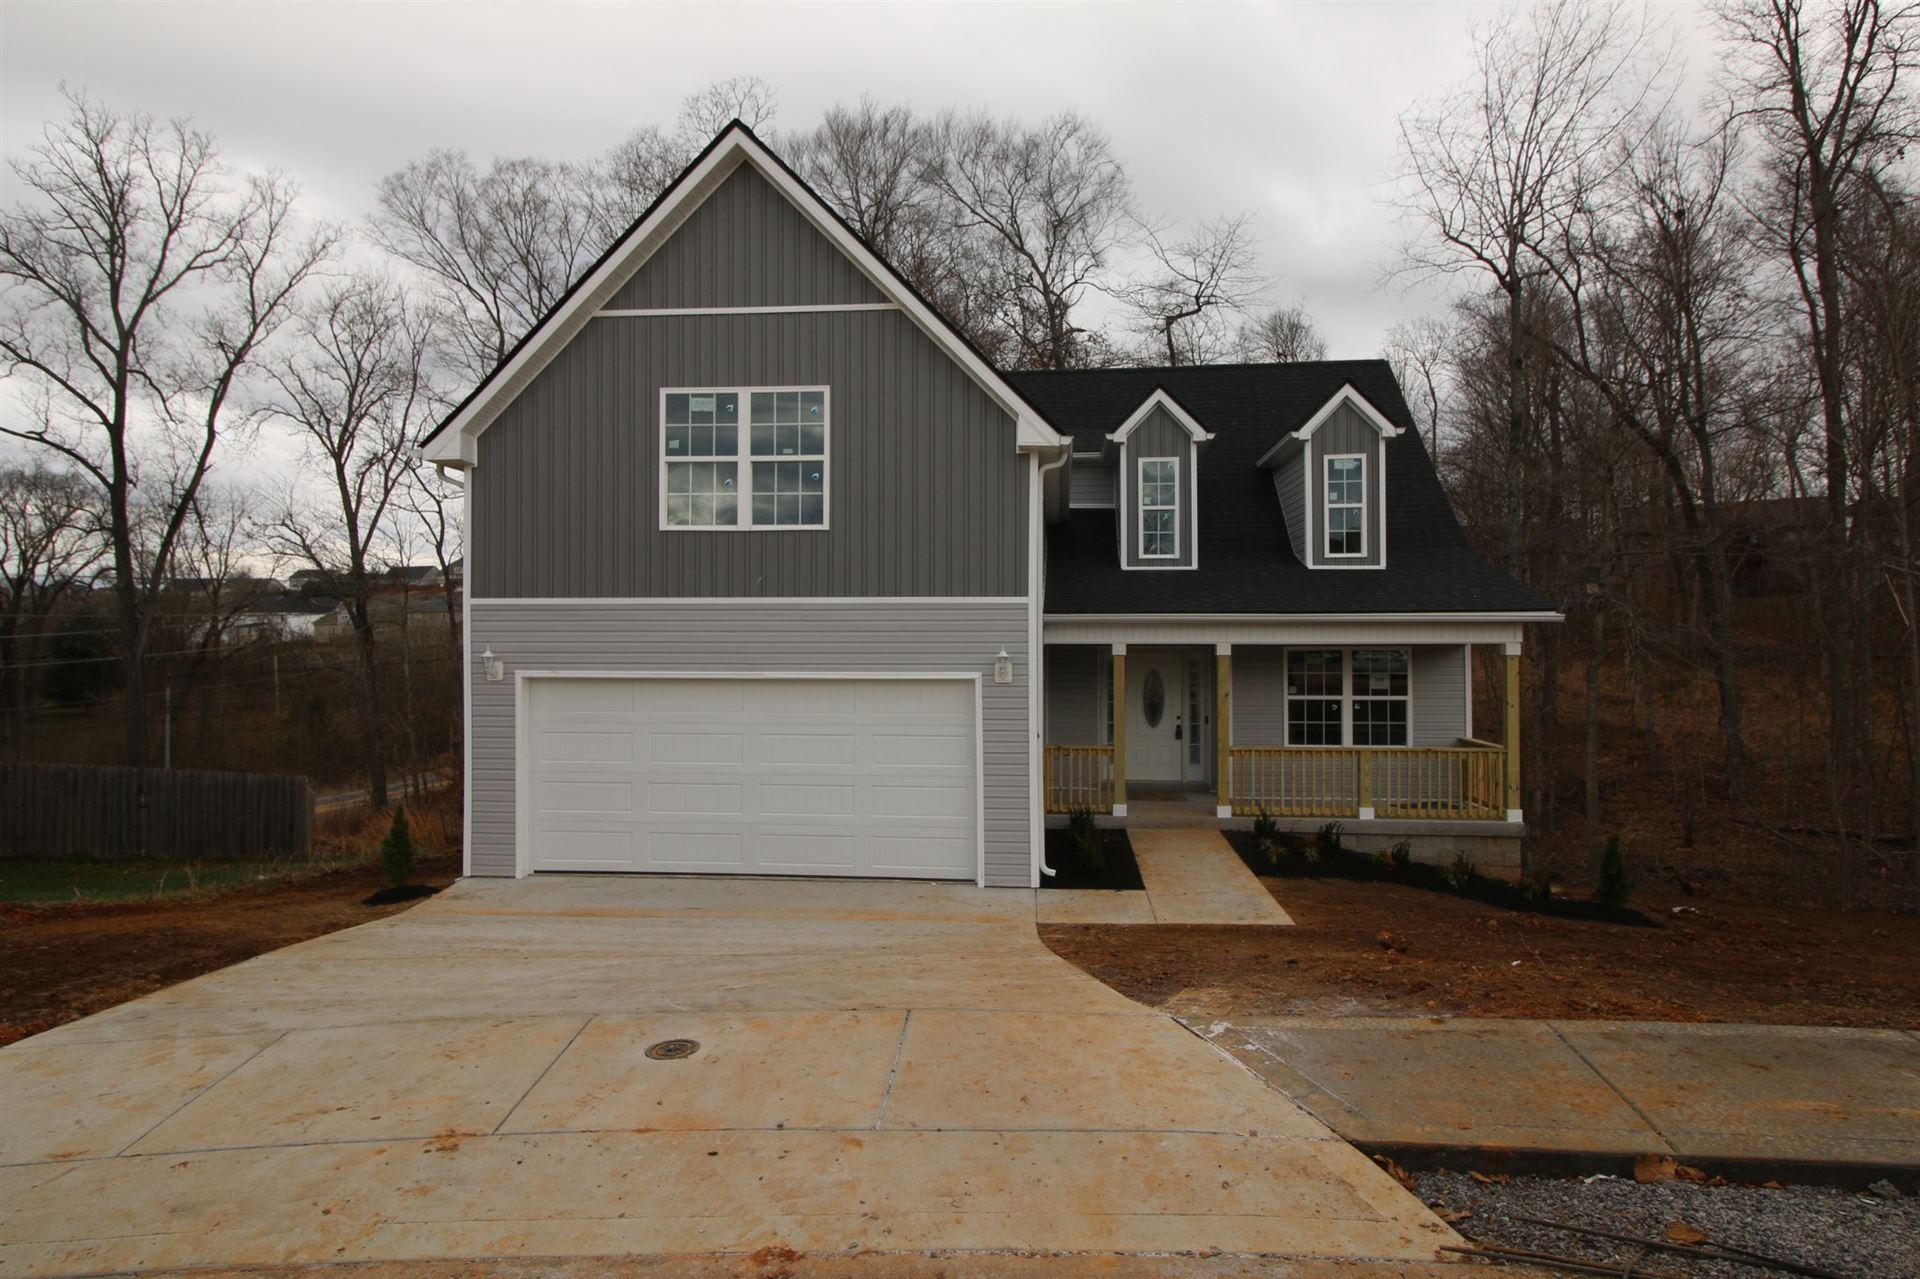 166 Eagles Bluff, Clarksville, TN 37040 - MLS#: 2187579